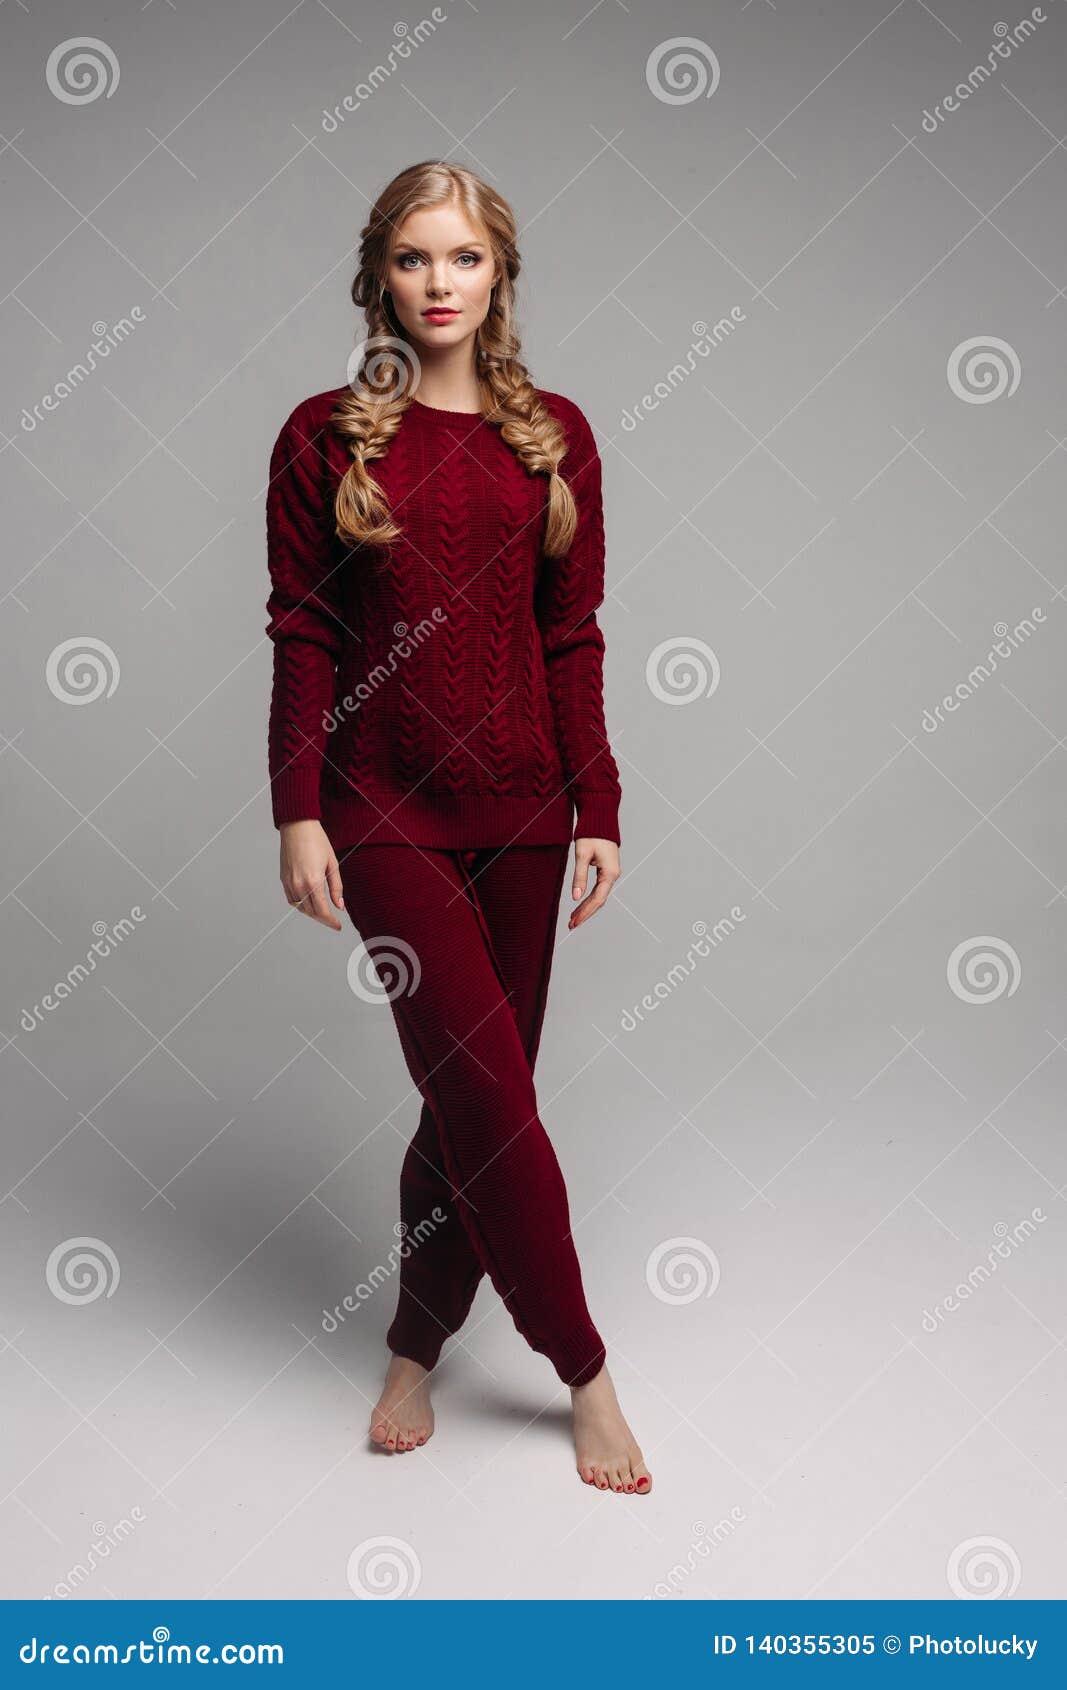 b3336244cd Young Beautiful Girl In Bordo Clothes Posing At Camera. Stock Image ...